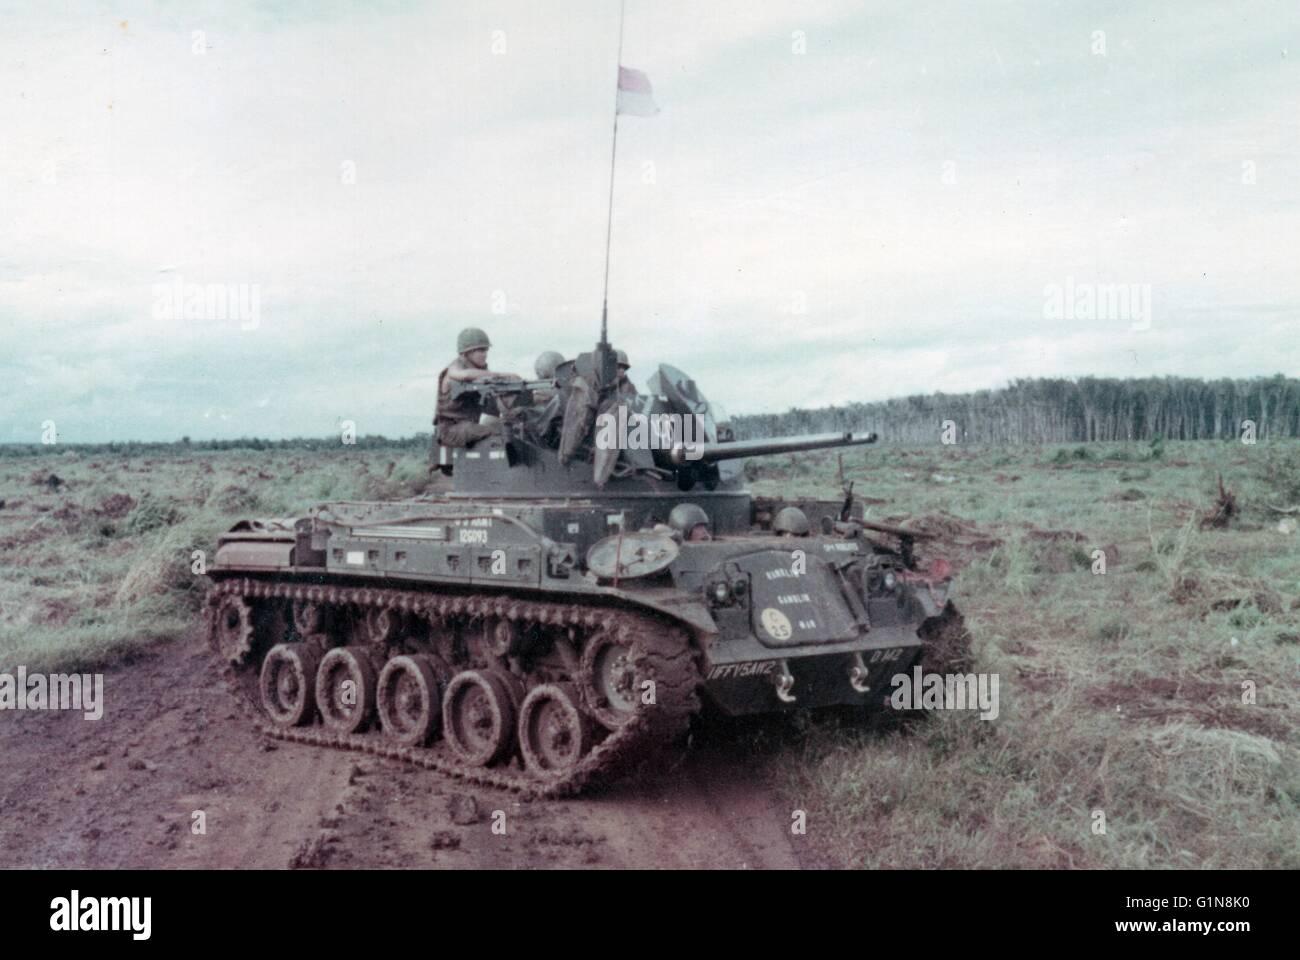 Vietnam War 1954-1975 American-twin-40mm-tank-duster-phuoc-tuy-province-south-vietnam-1969-G1N8K0